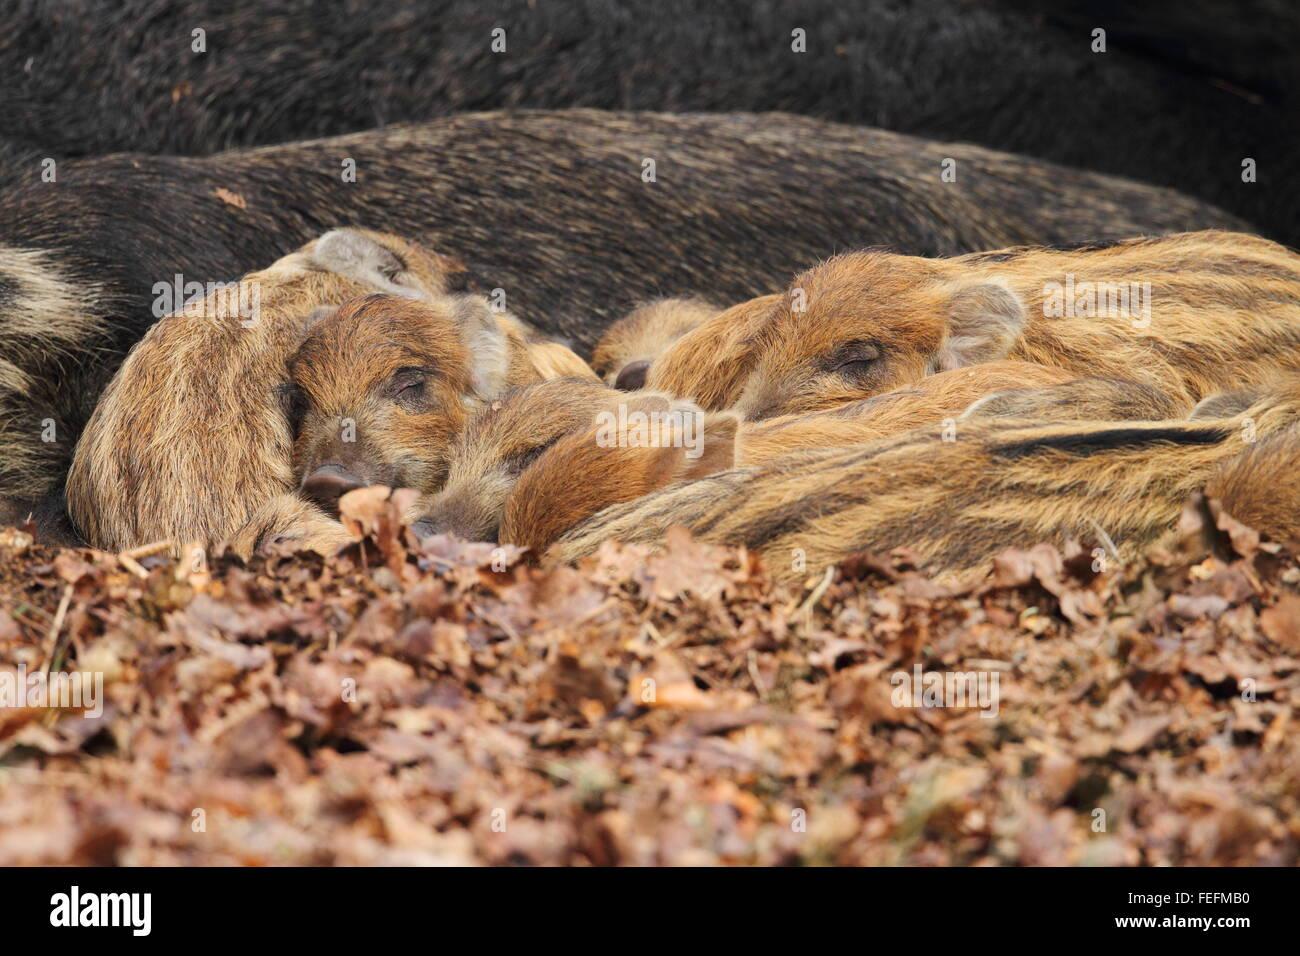 Sleeping Wild Boar piglets (Sus scrofa), Forest of Dean UK - Stock Image